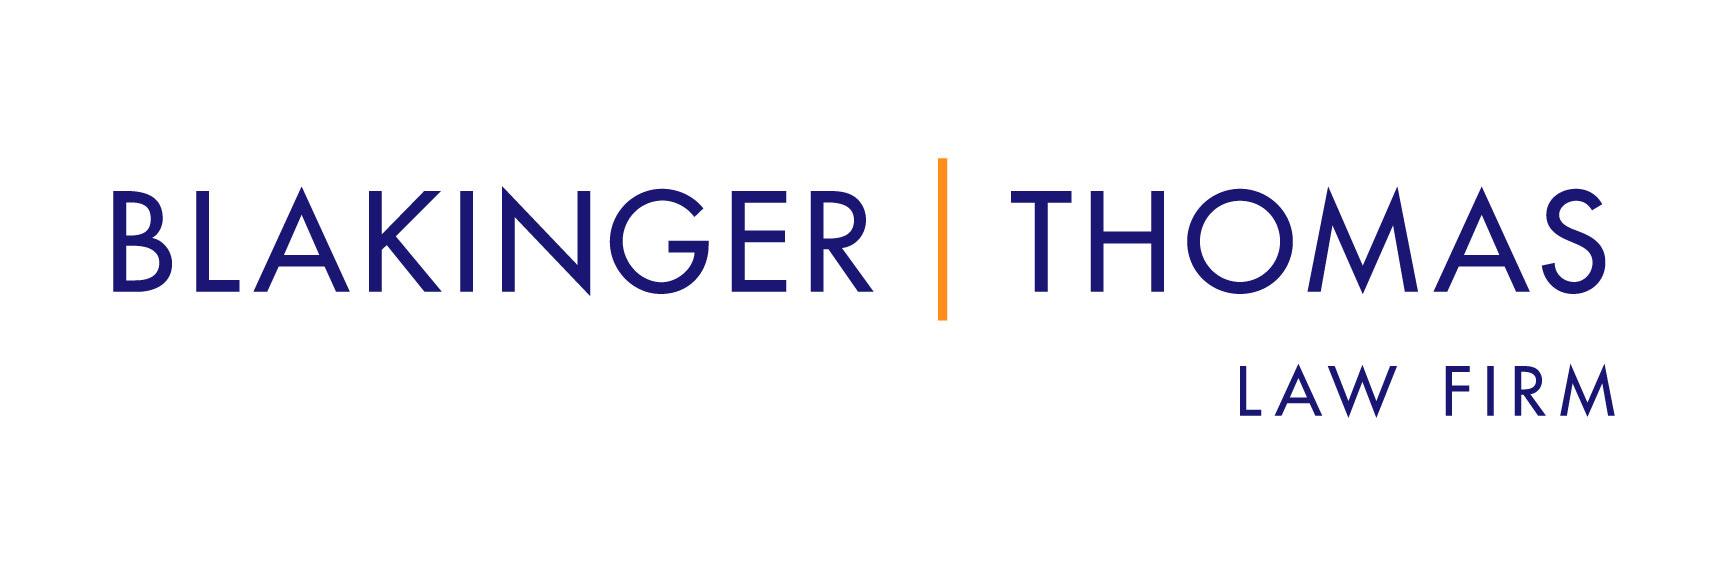 blakinger thomas logo